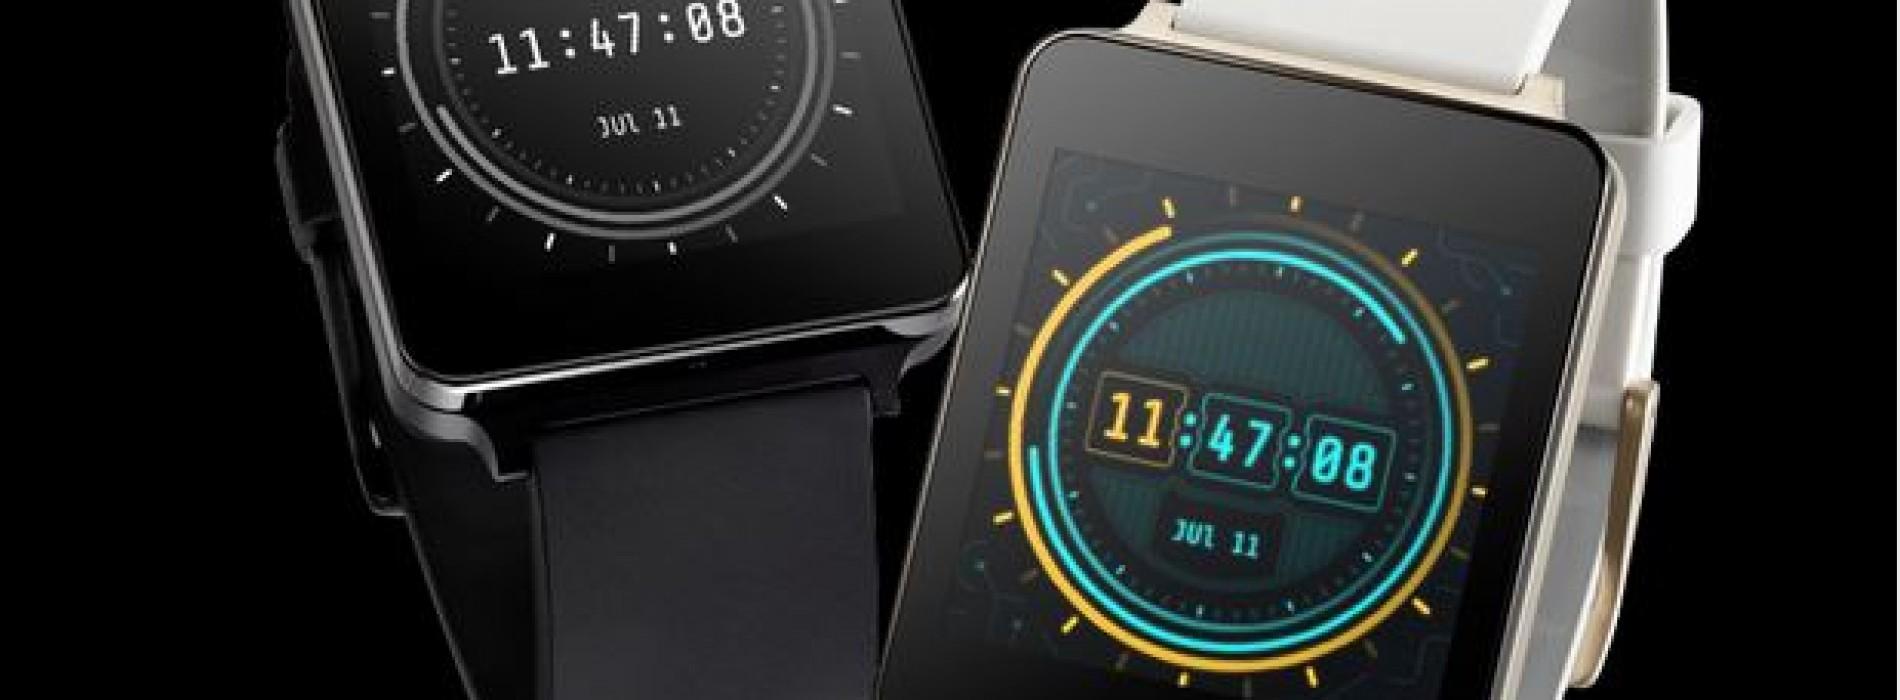 Watch This App: Chron Watch